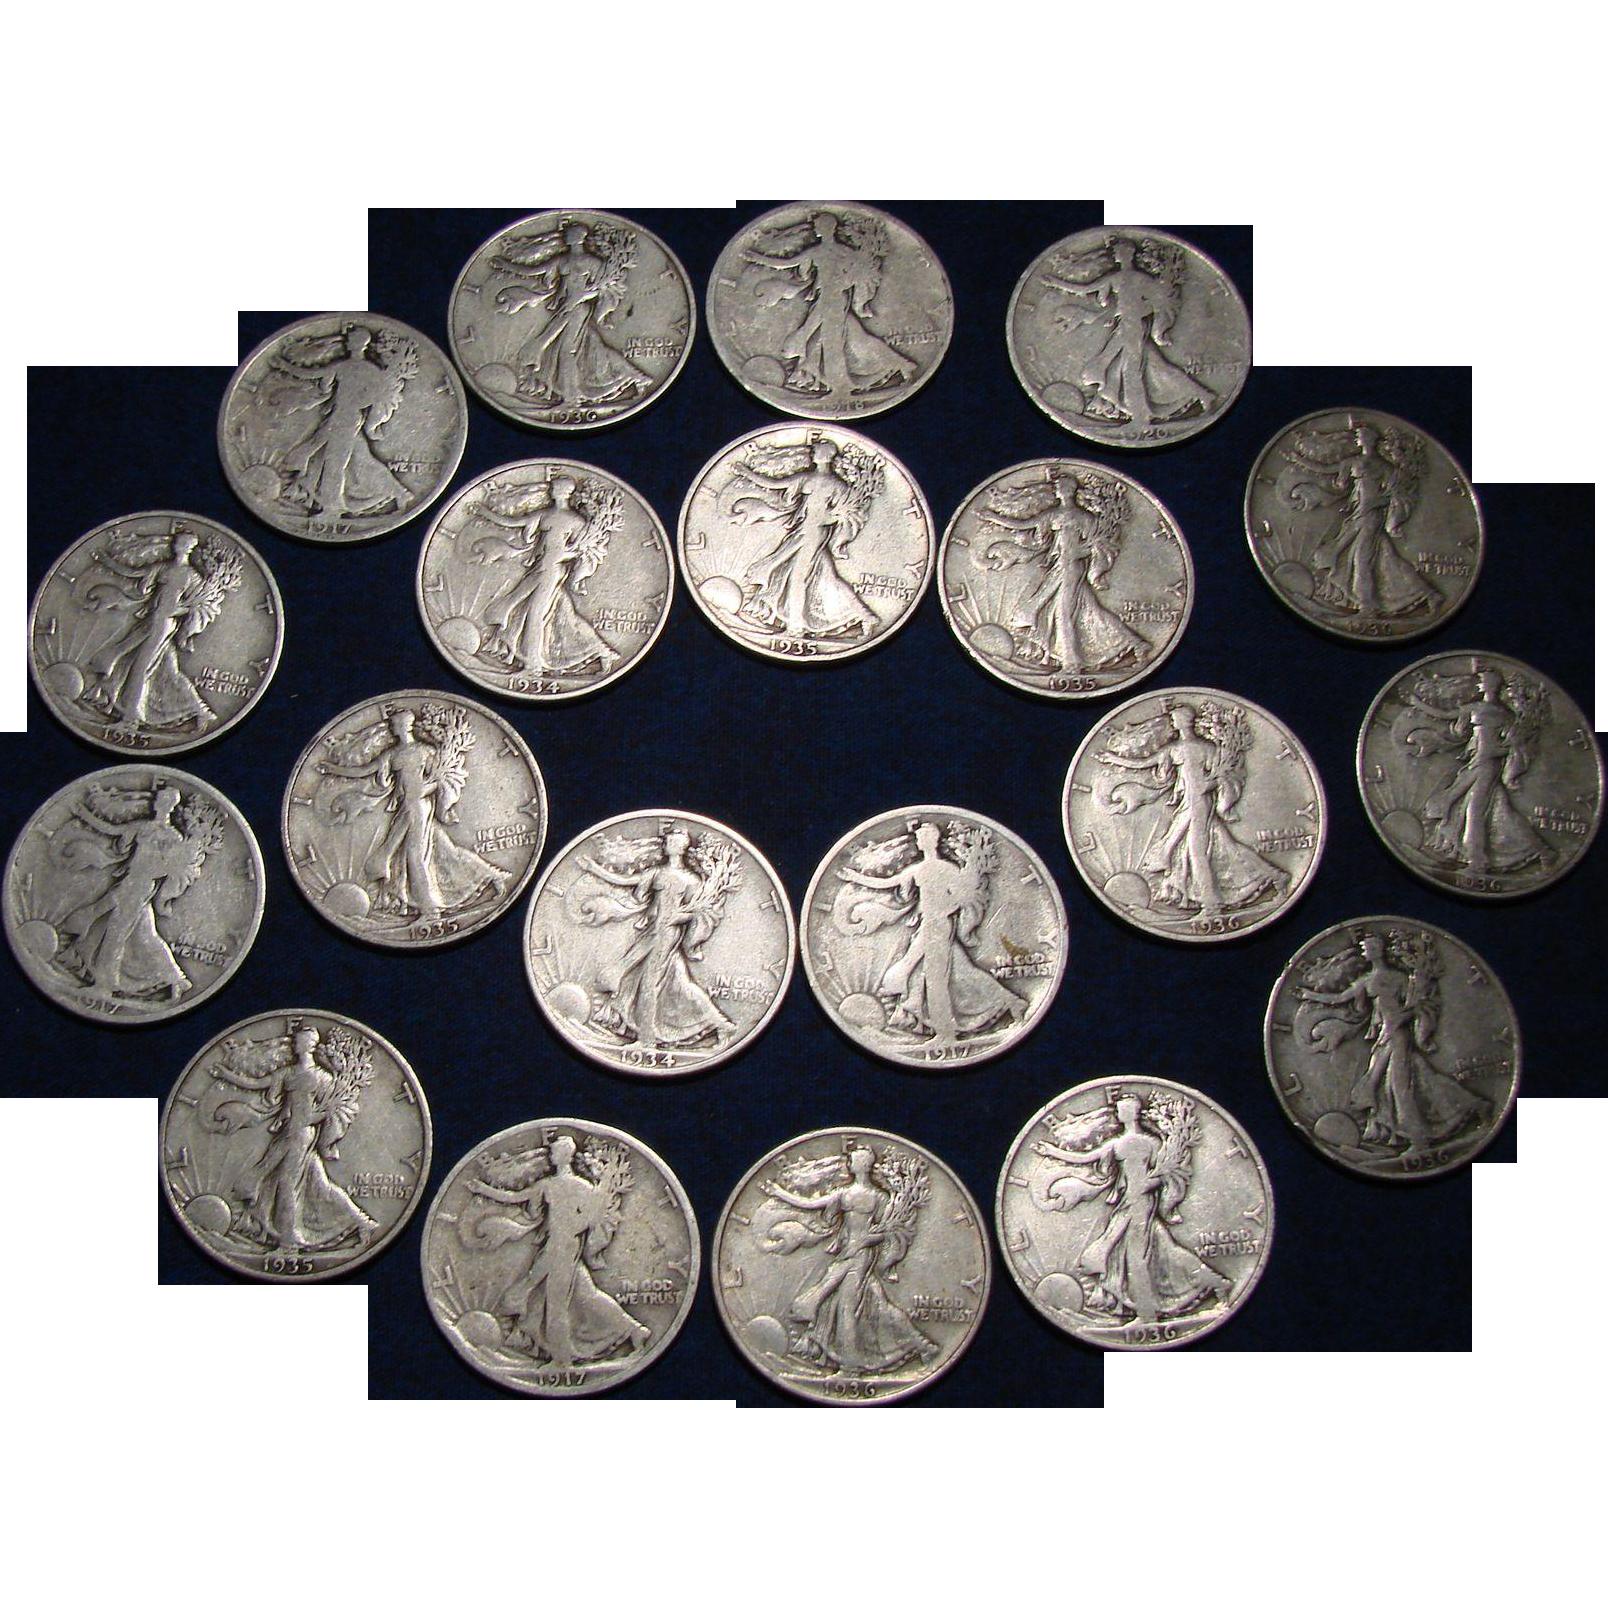 Twenty Silver Walking Liberty Half Dollars- One Roll